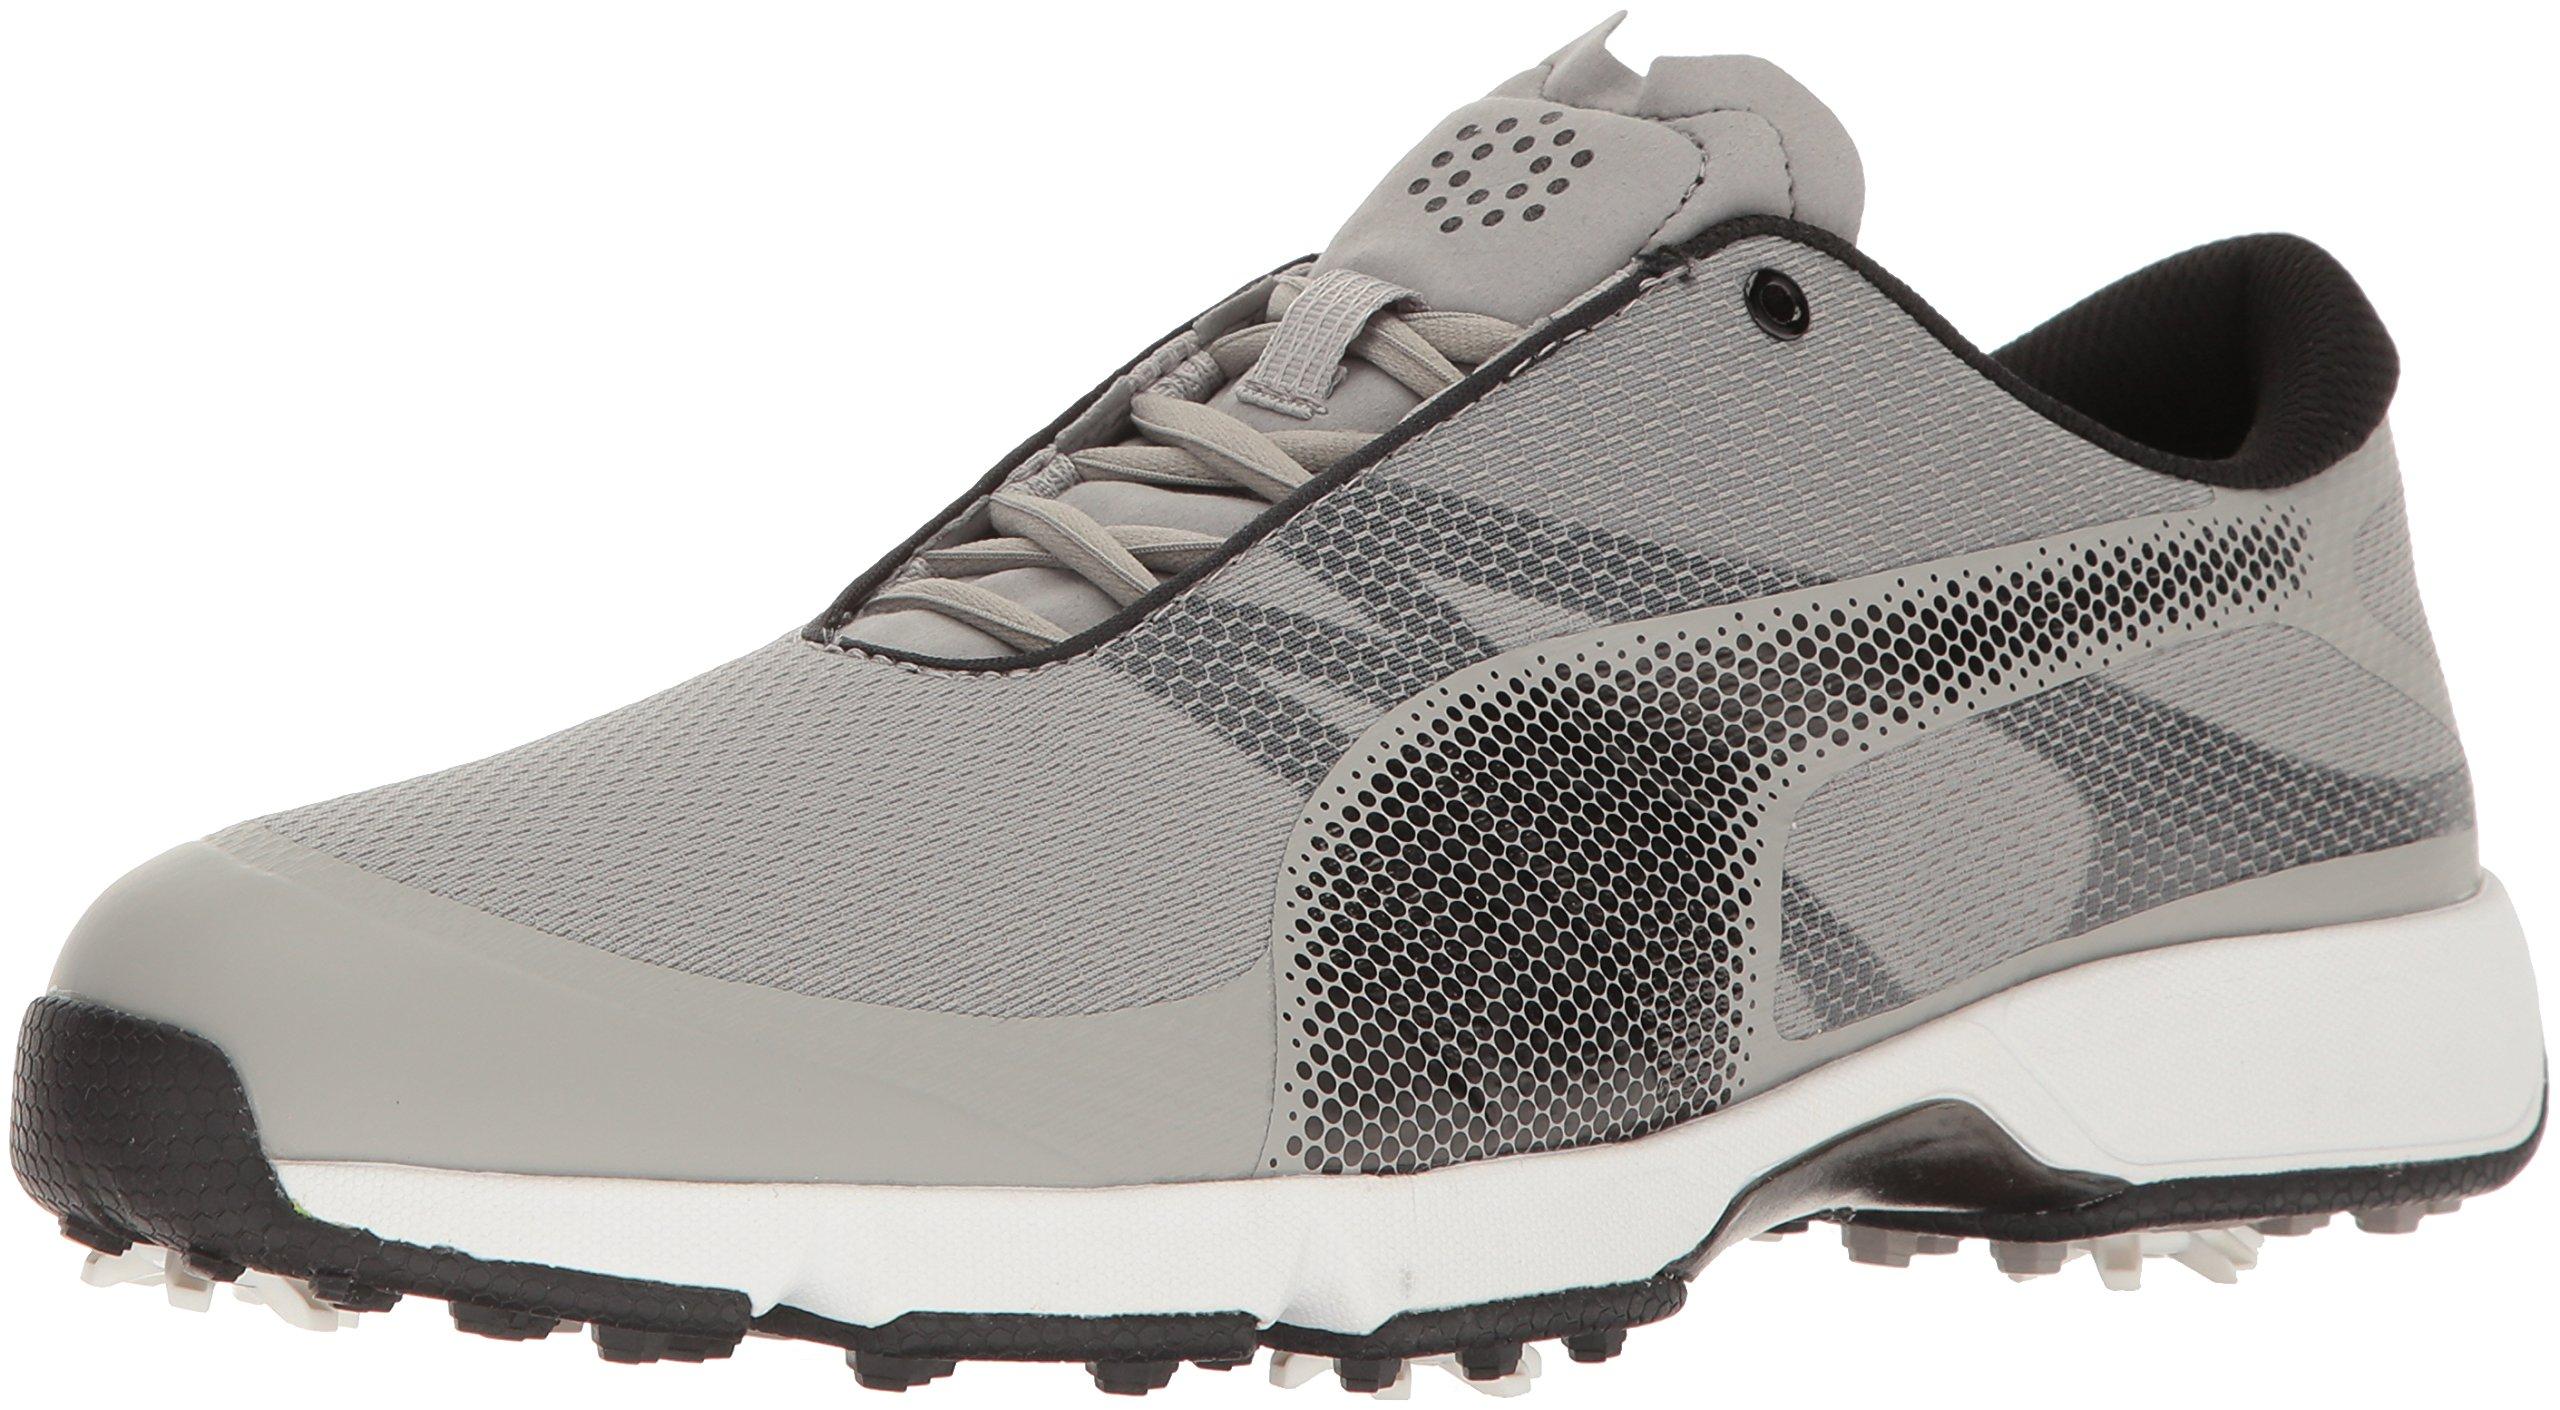 PUMA Golf Men's Ignite Drive Sport Golf Shoe, Drizzle Black White, 12 Medium US by PUMA